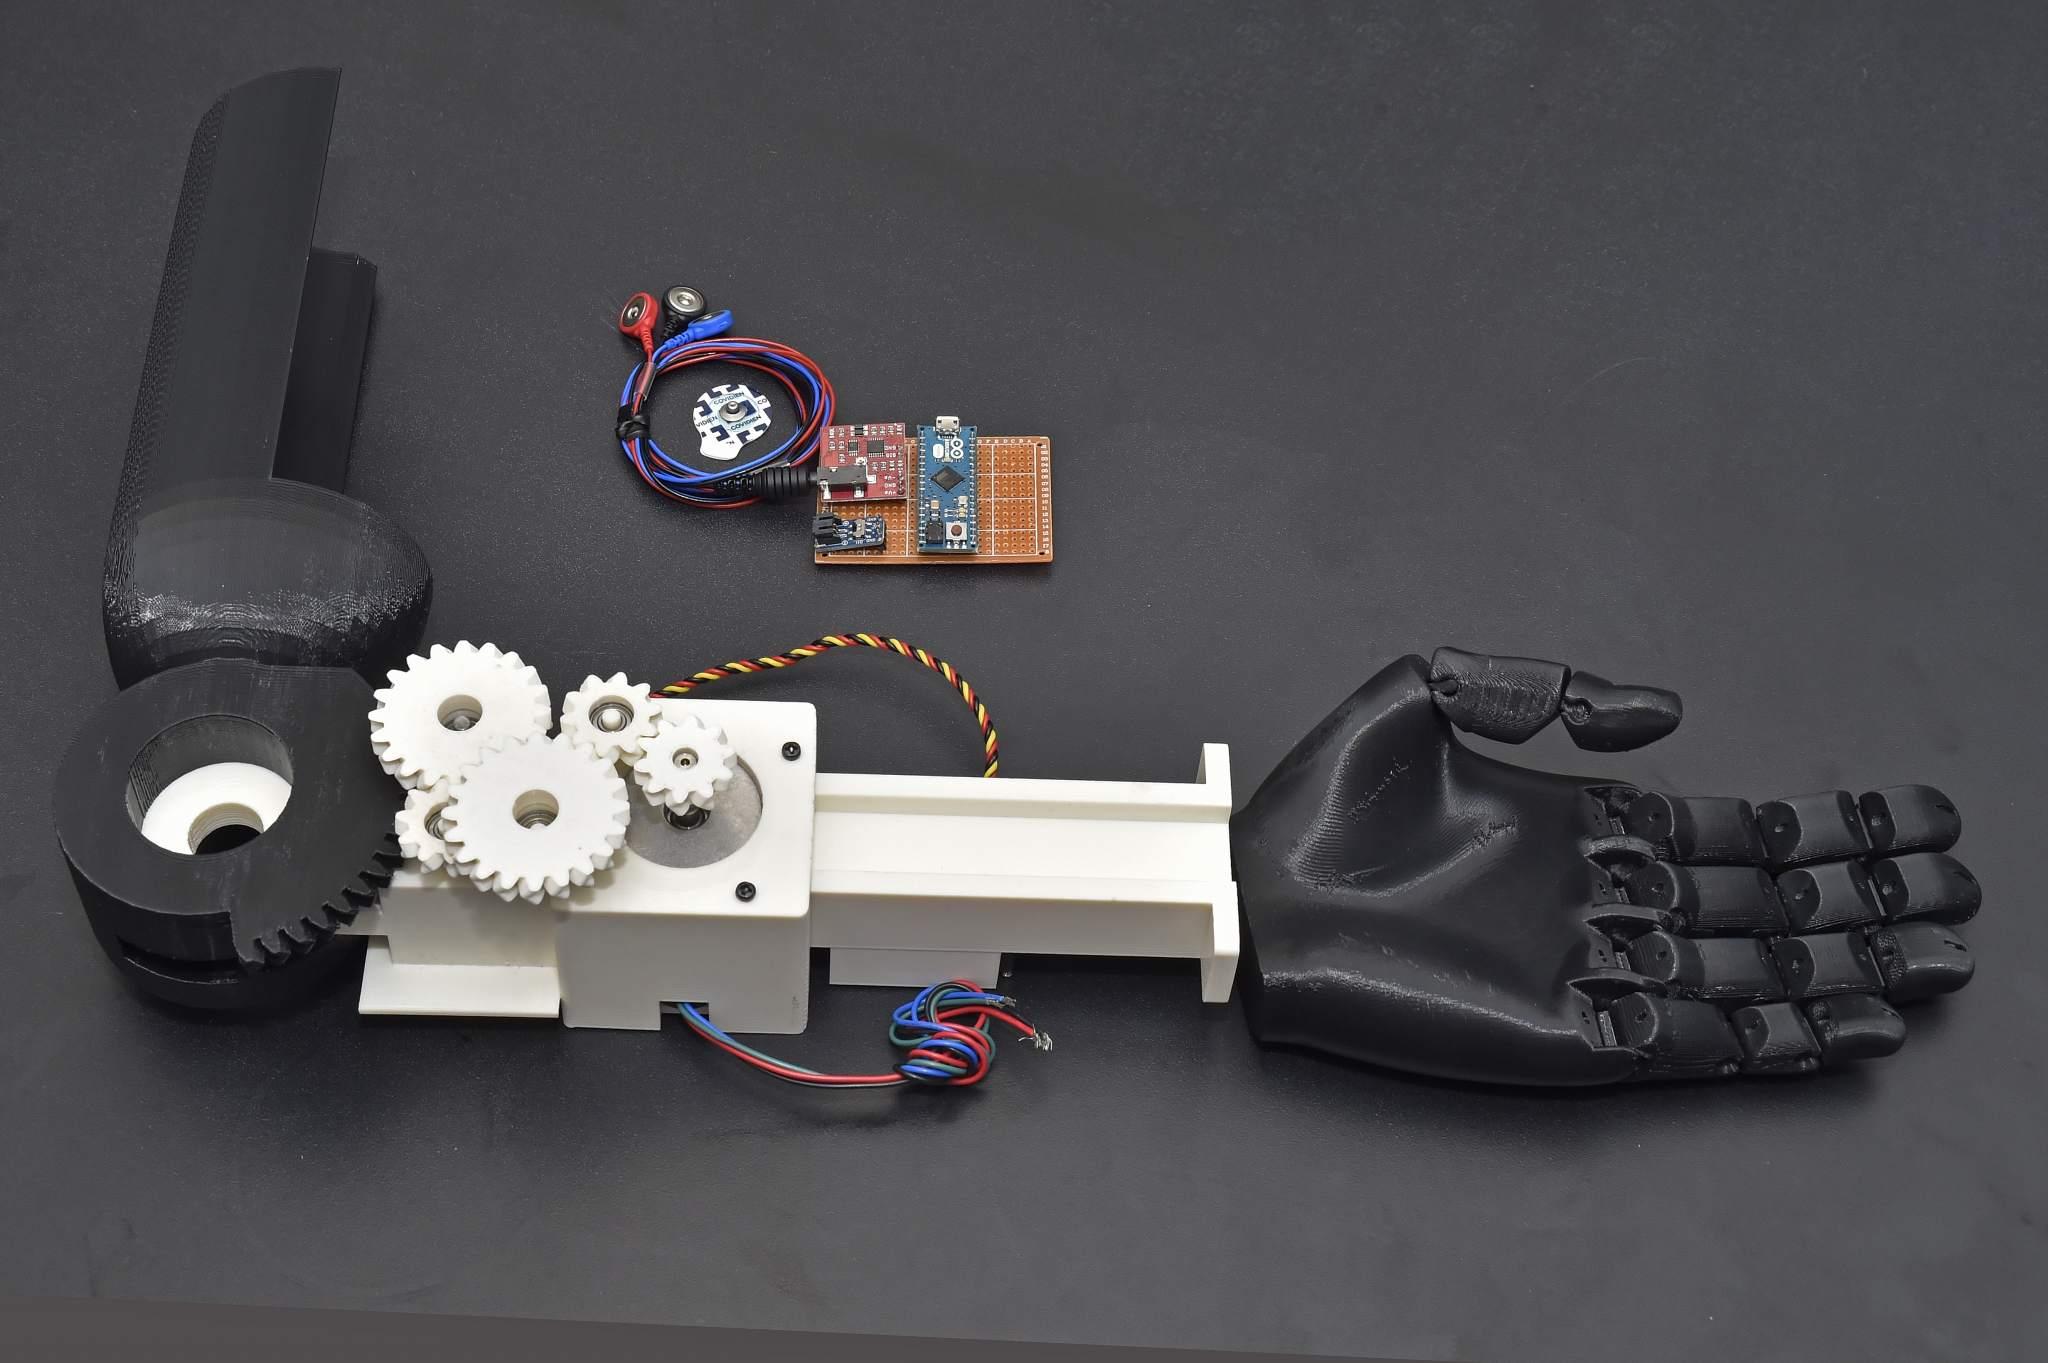 image: MIT Lincoln Laboratory's Technology Office Innovation Laboratory